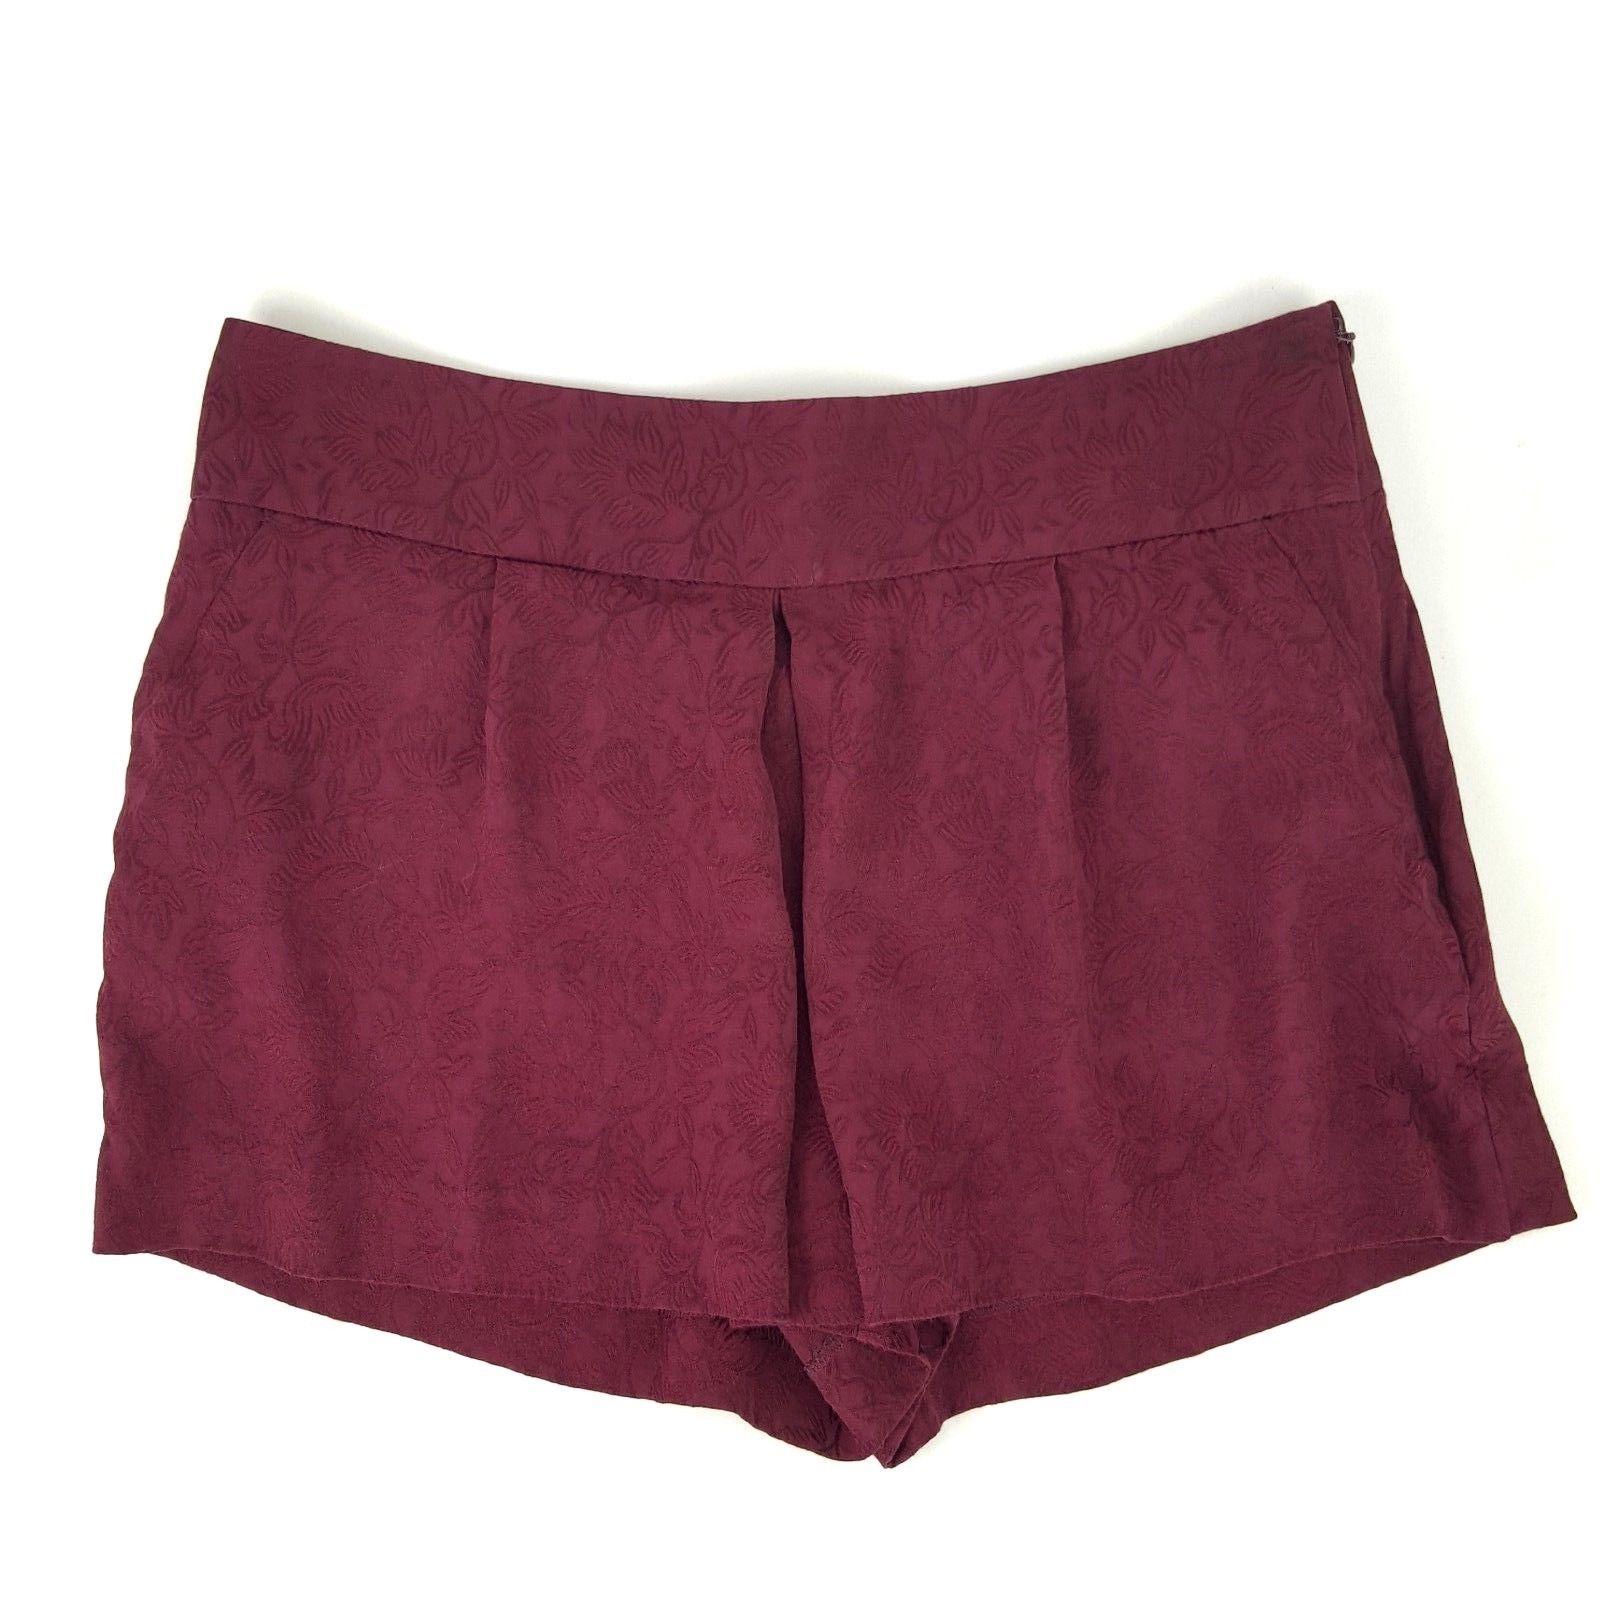 485dd576684 Ann Taylor Loft Womens Size 4 Burgundy Floral Damask Skort Shorts EUC -   14.95